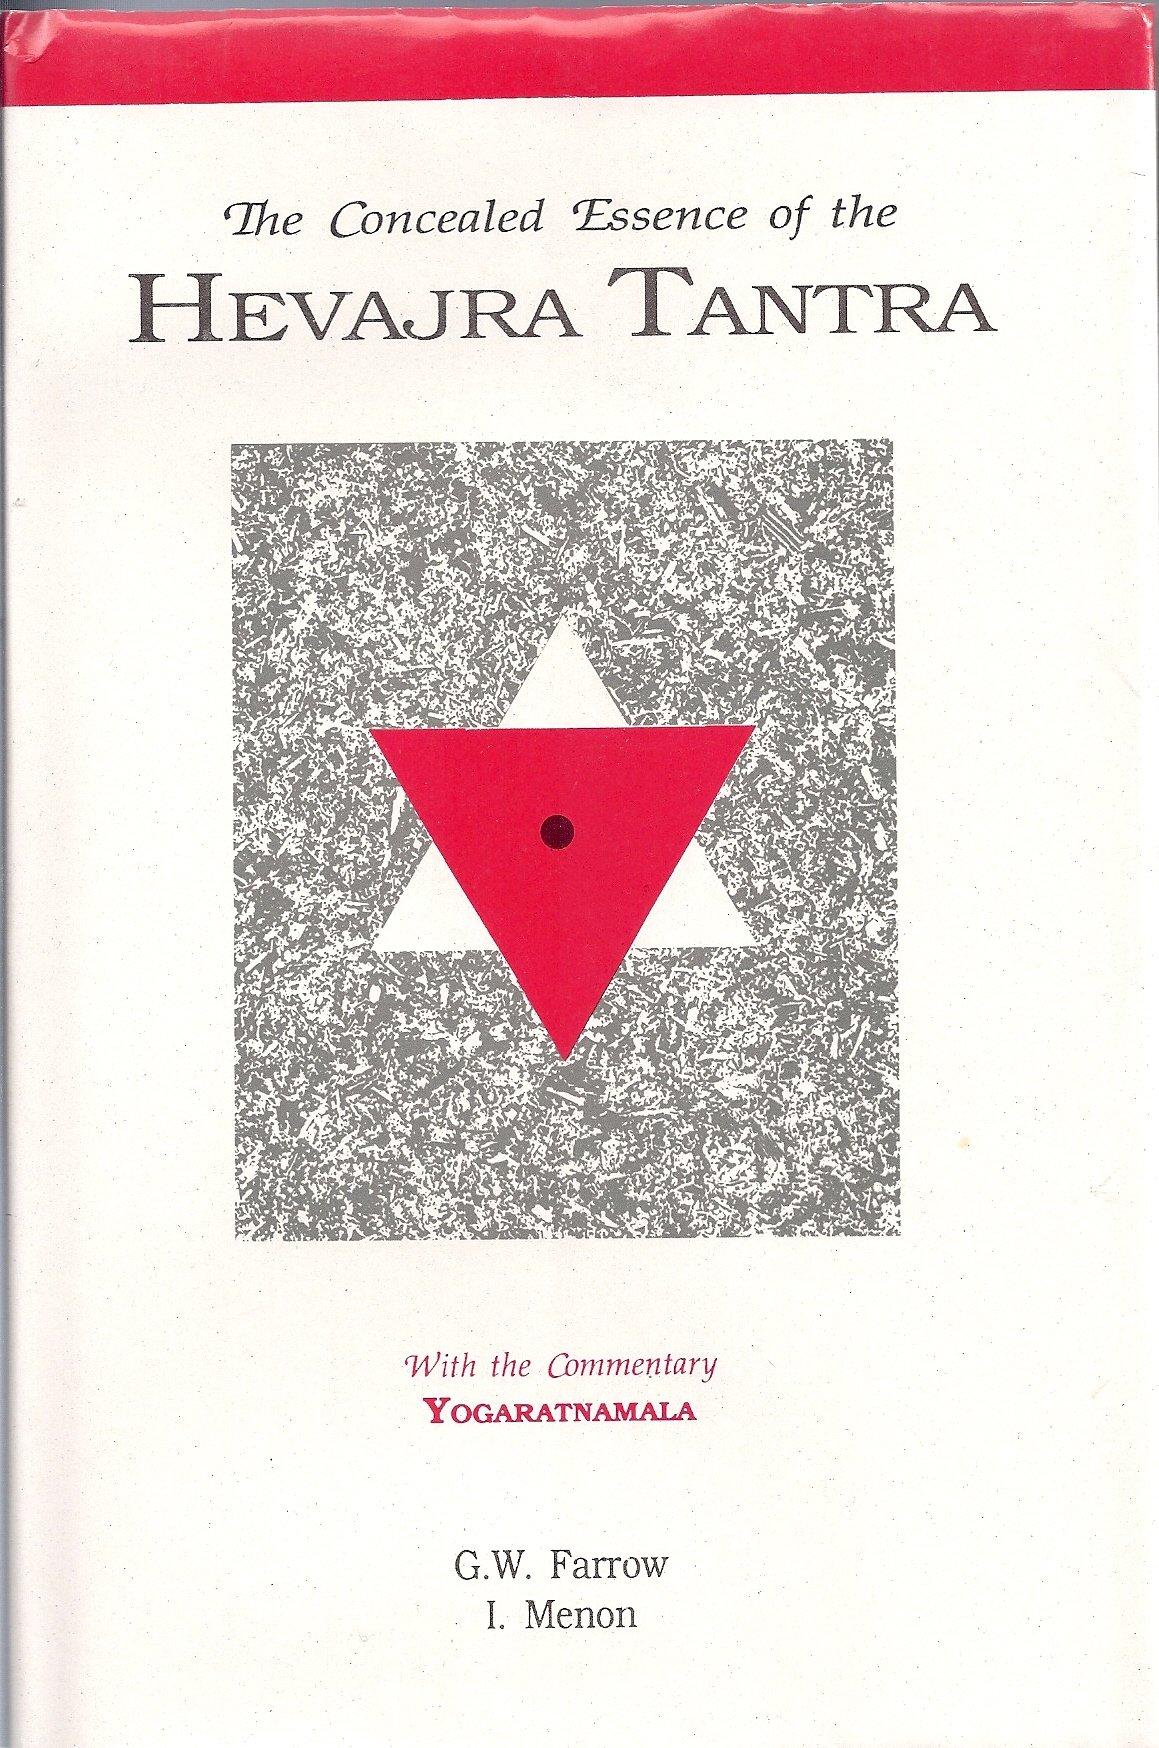 The concealed essence of the hevajra tantra with the commentary yogaratnamala g w farrow i menon 9788120809116 amazon com books